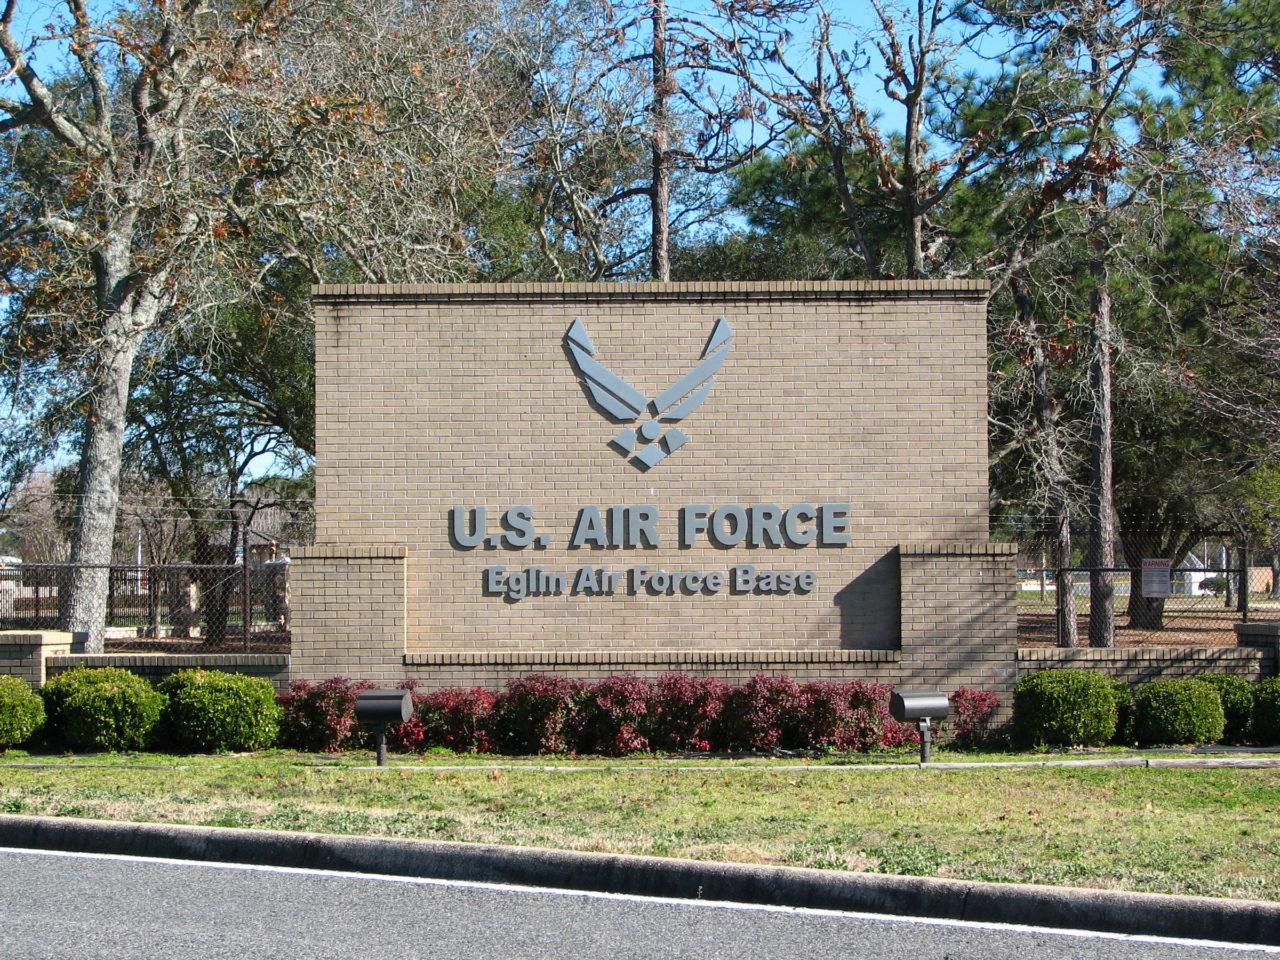 Eglin Air Force Base southwest of Valparaiso, Florida. Photo: U.S. Air Force.